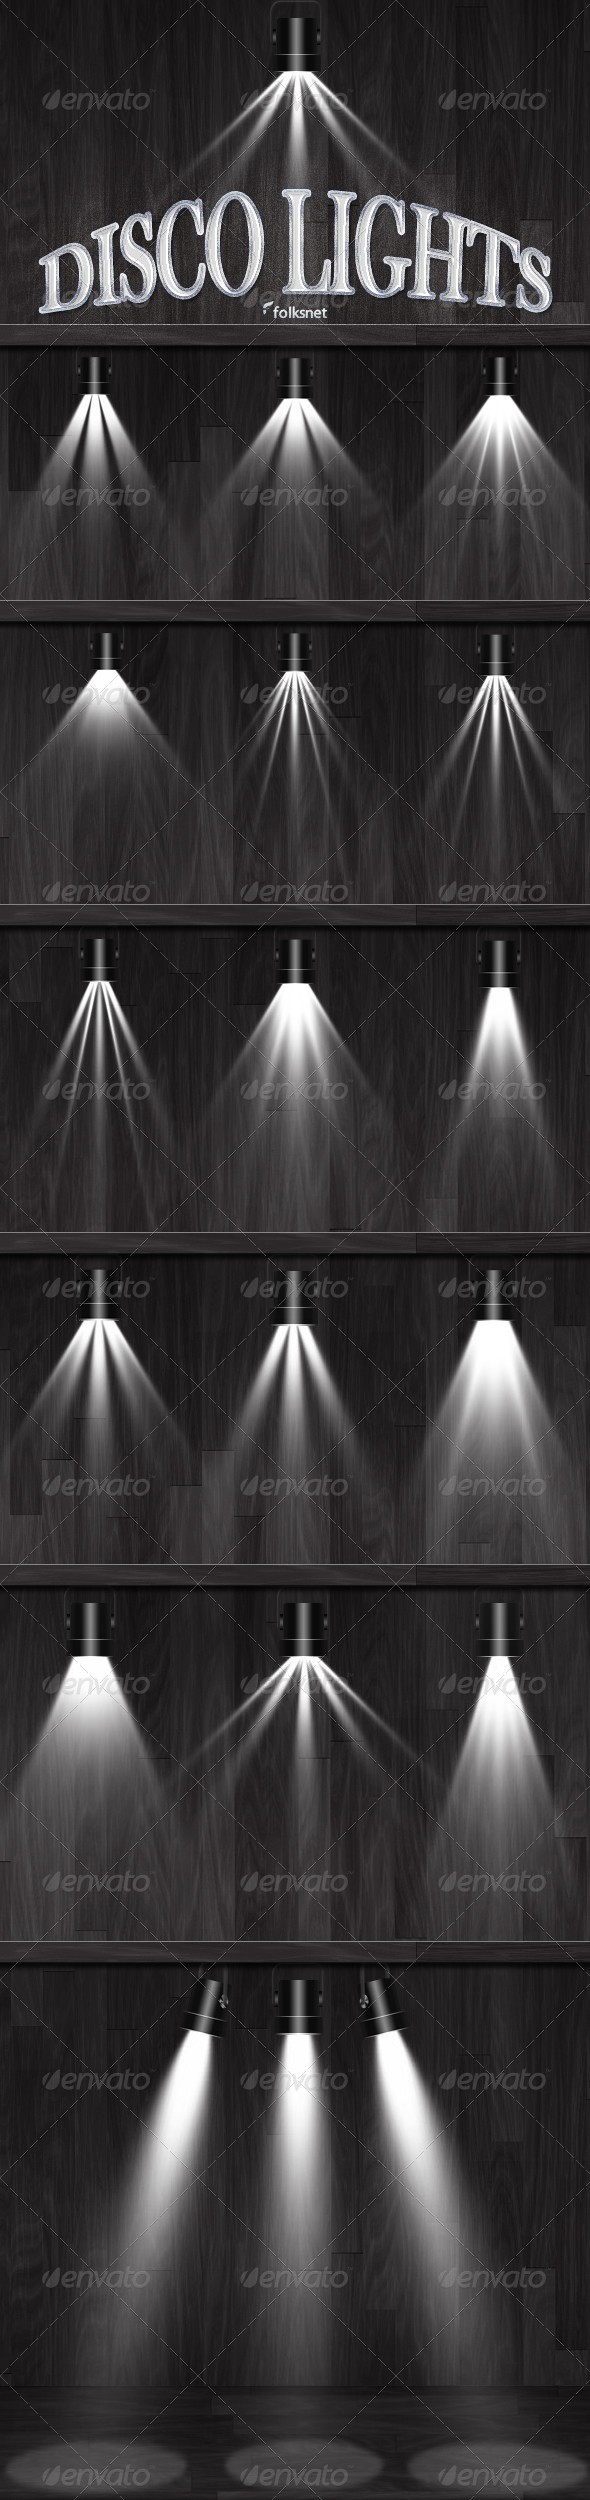 Disco Lights by GrDezign